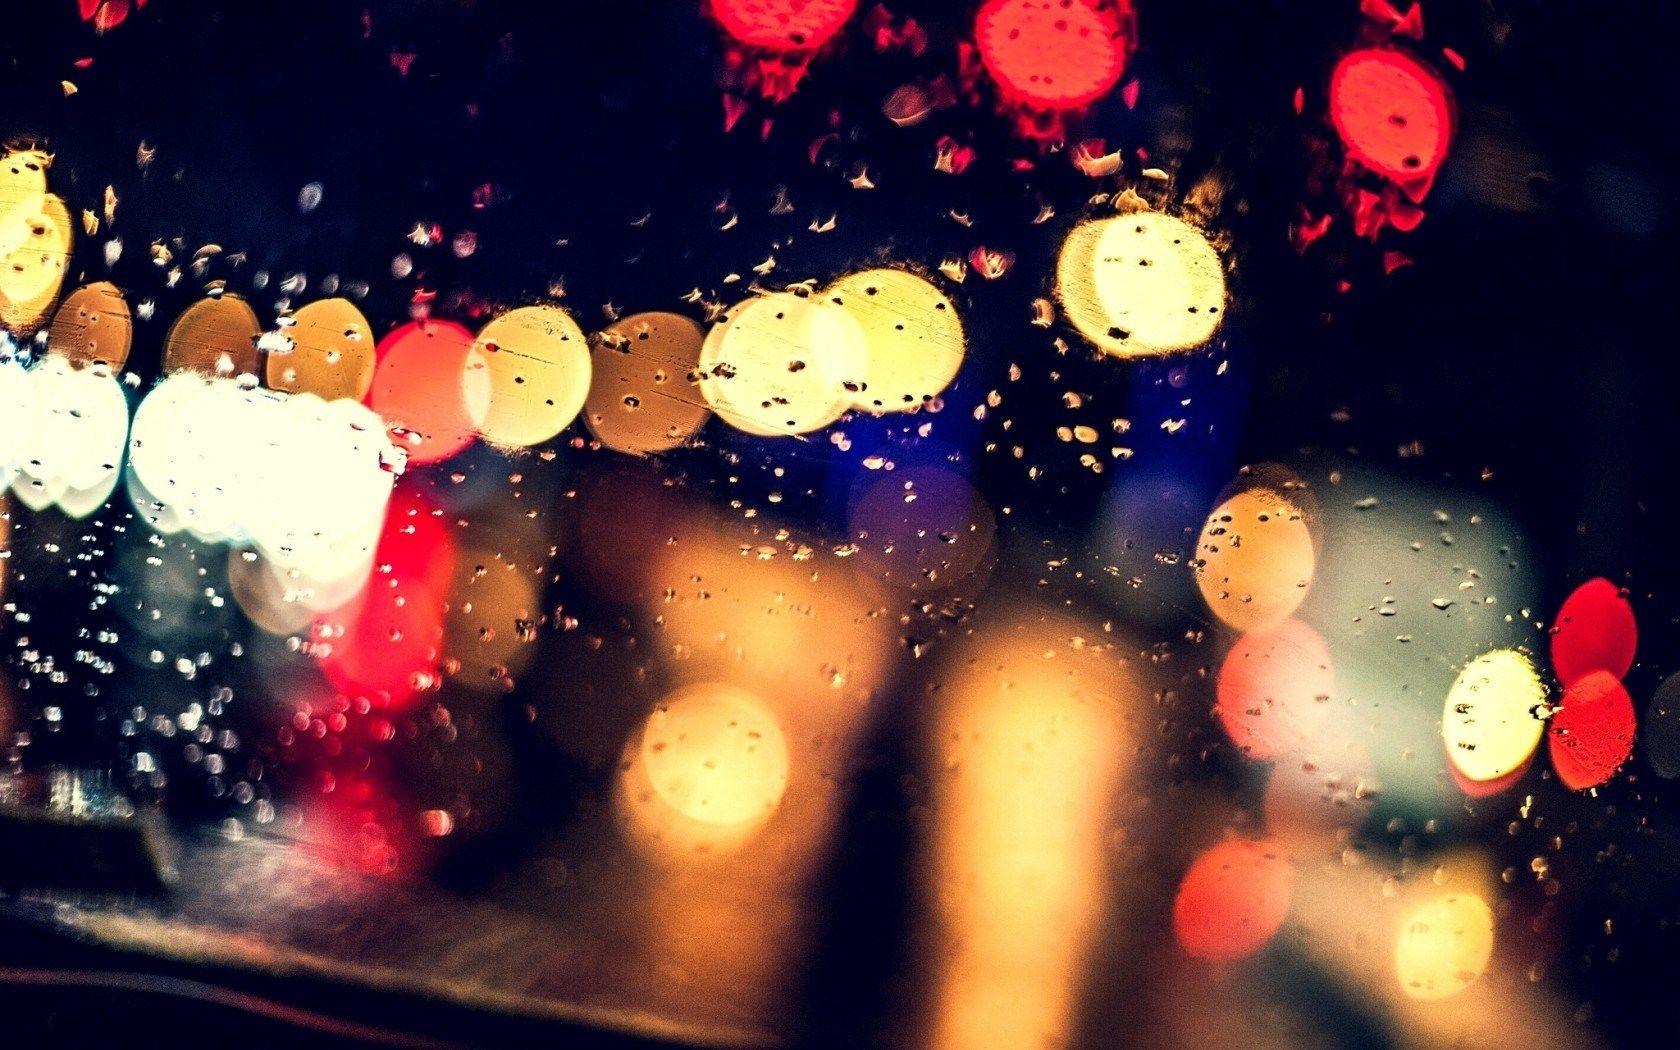 Wallpaper City Night Rain Street Road Lights Glass Water Drops Mood